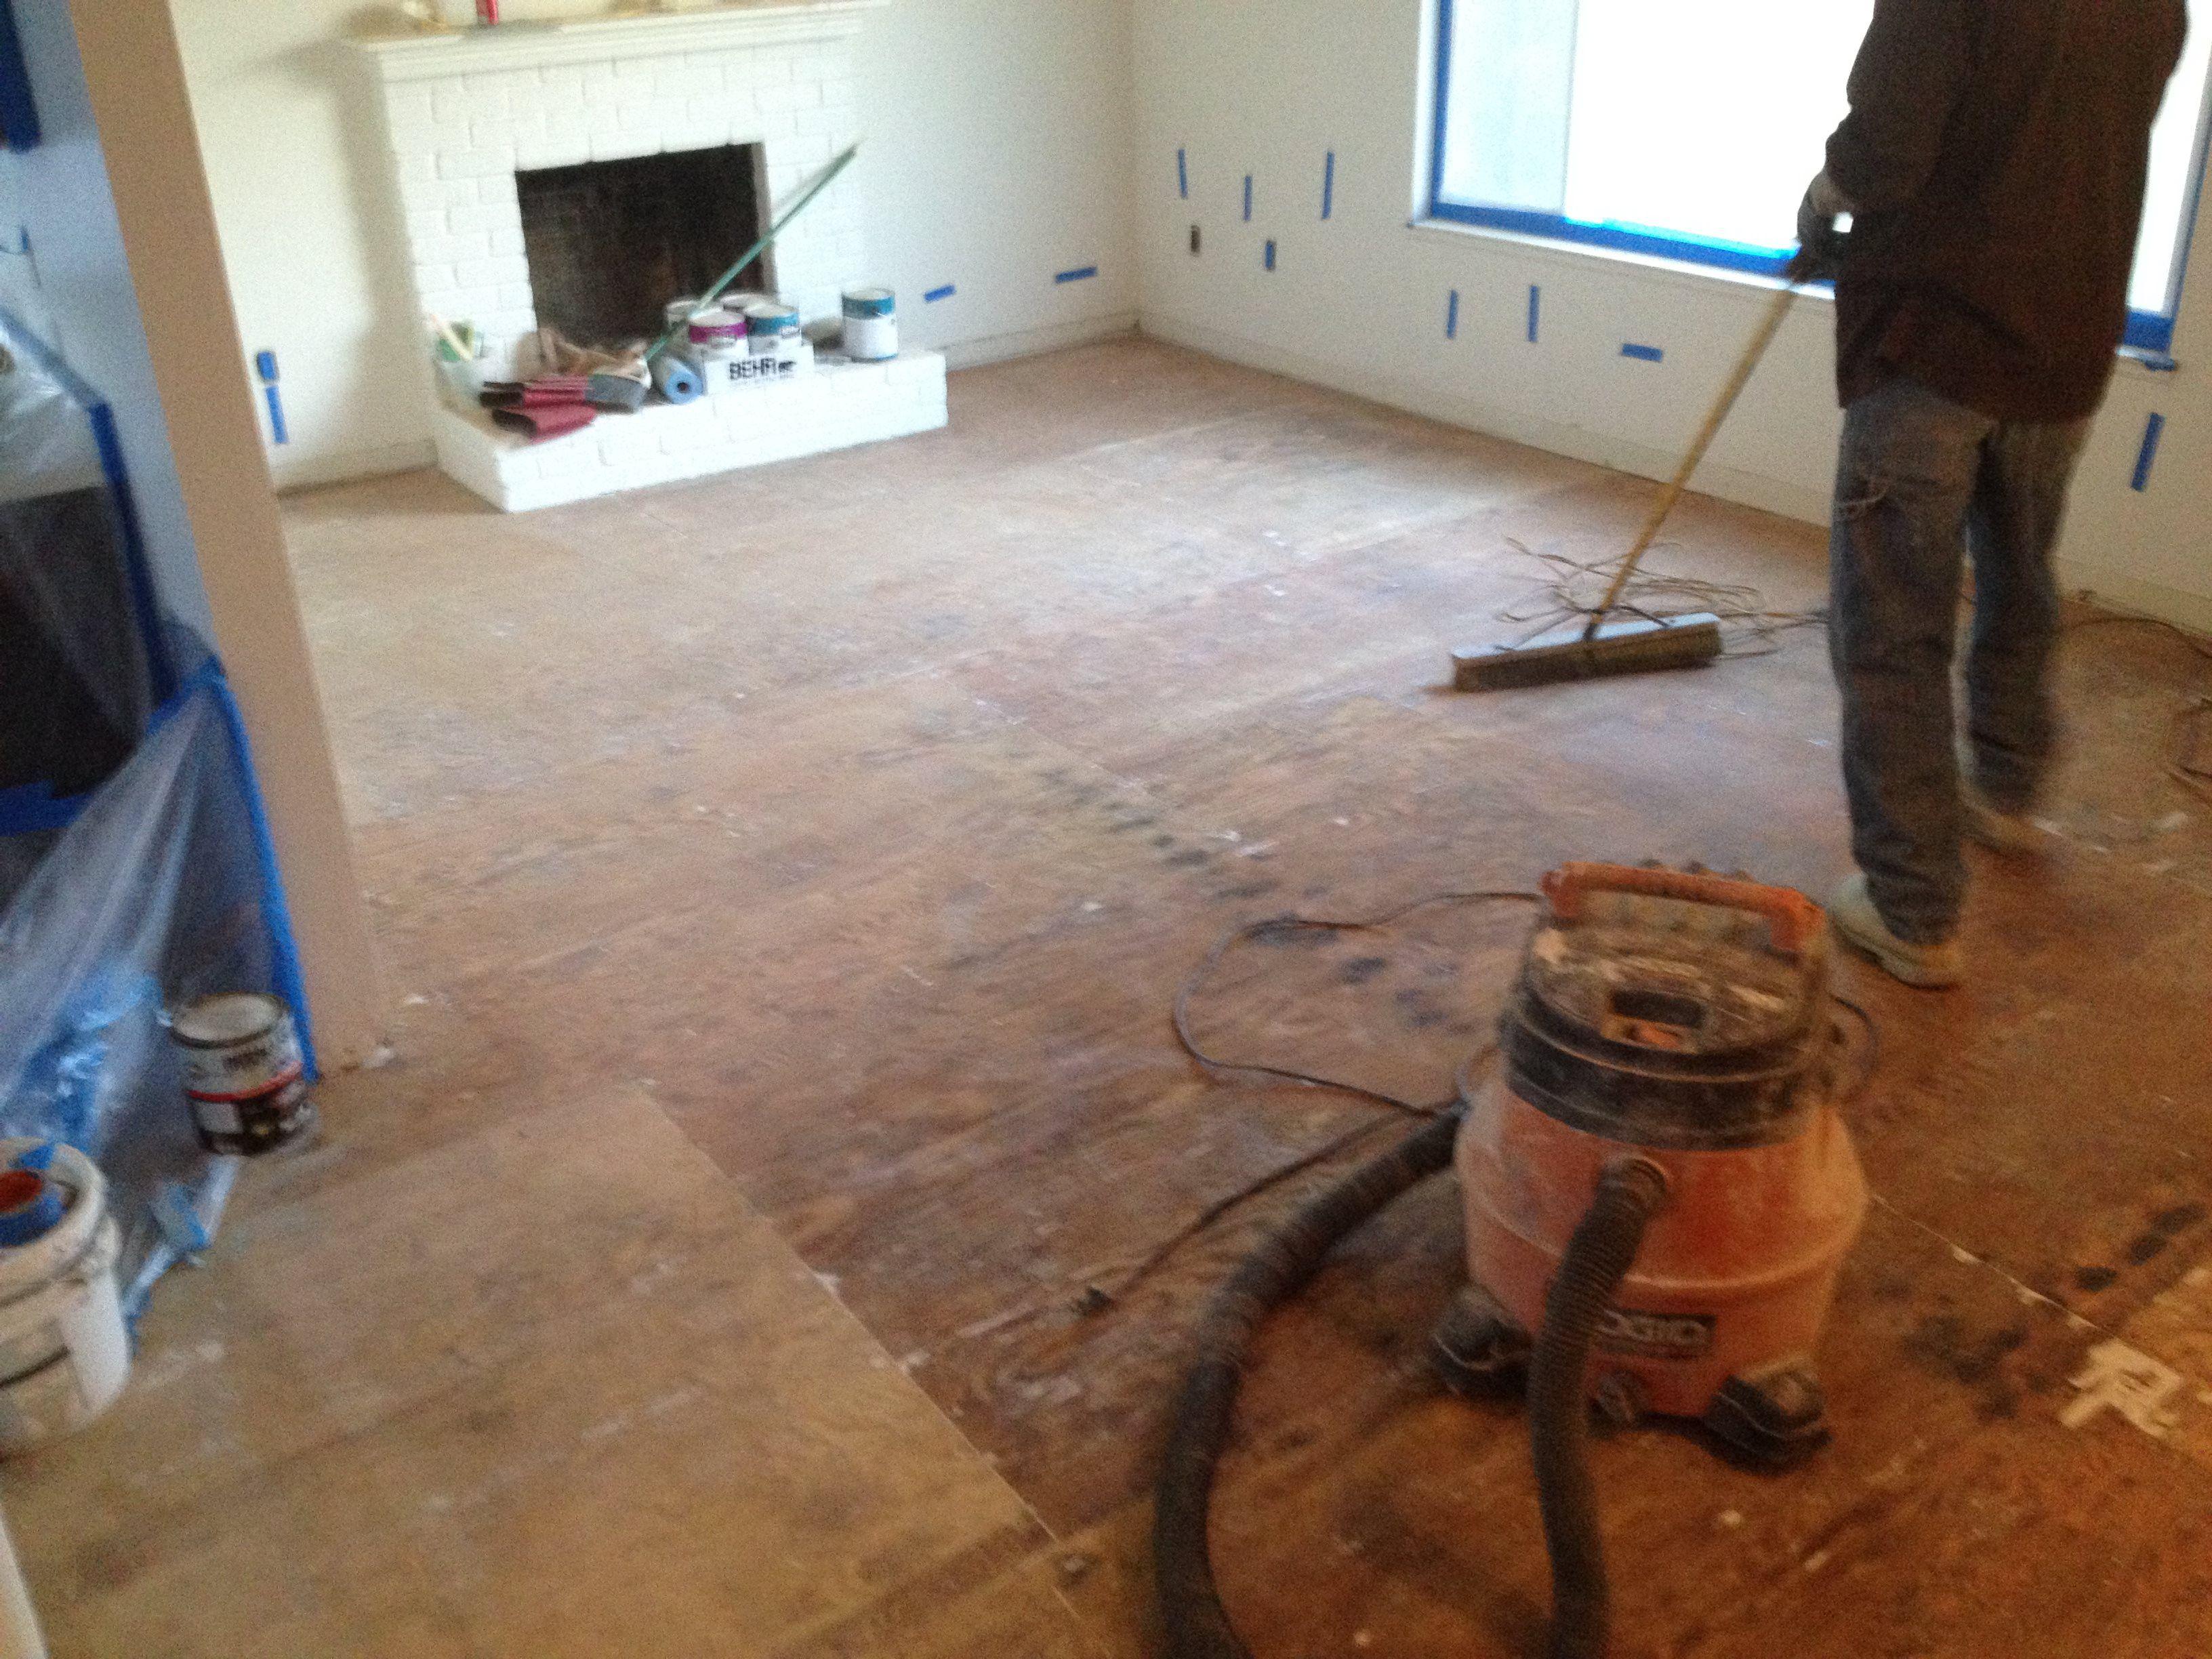 How to seal concrete floor from pet odor gurus floor for How to seal concrete floor